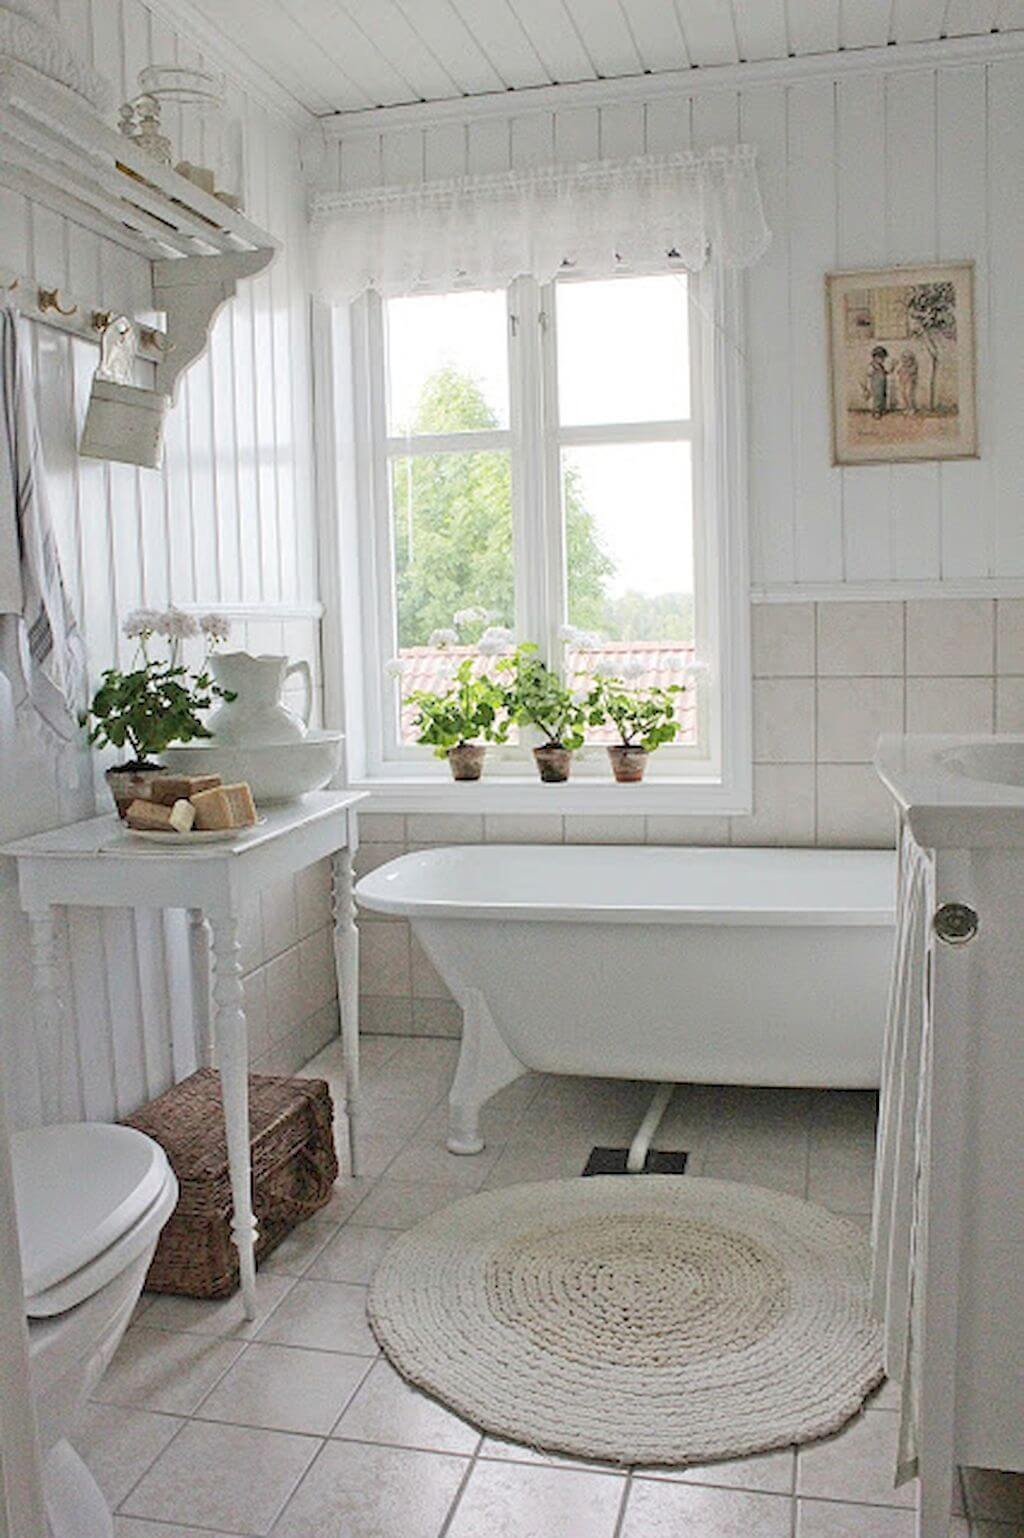 25 Stunning Shabby Chic Bathroom Designs That Will Adore You - 2864F93Cb15E84808B4F71F363266054